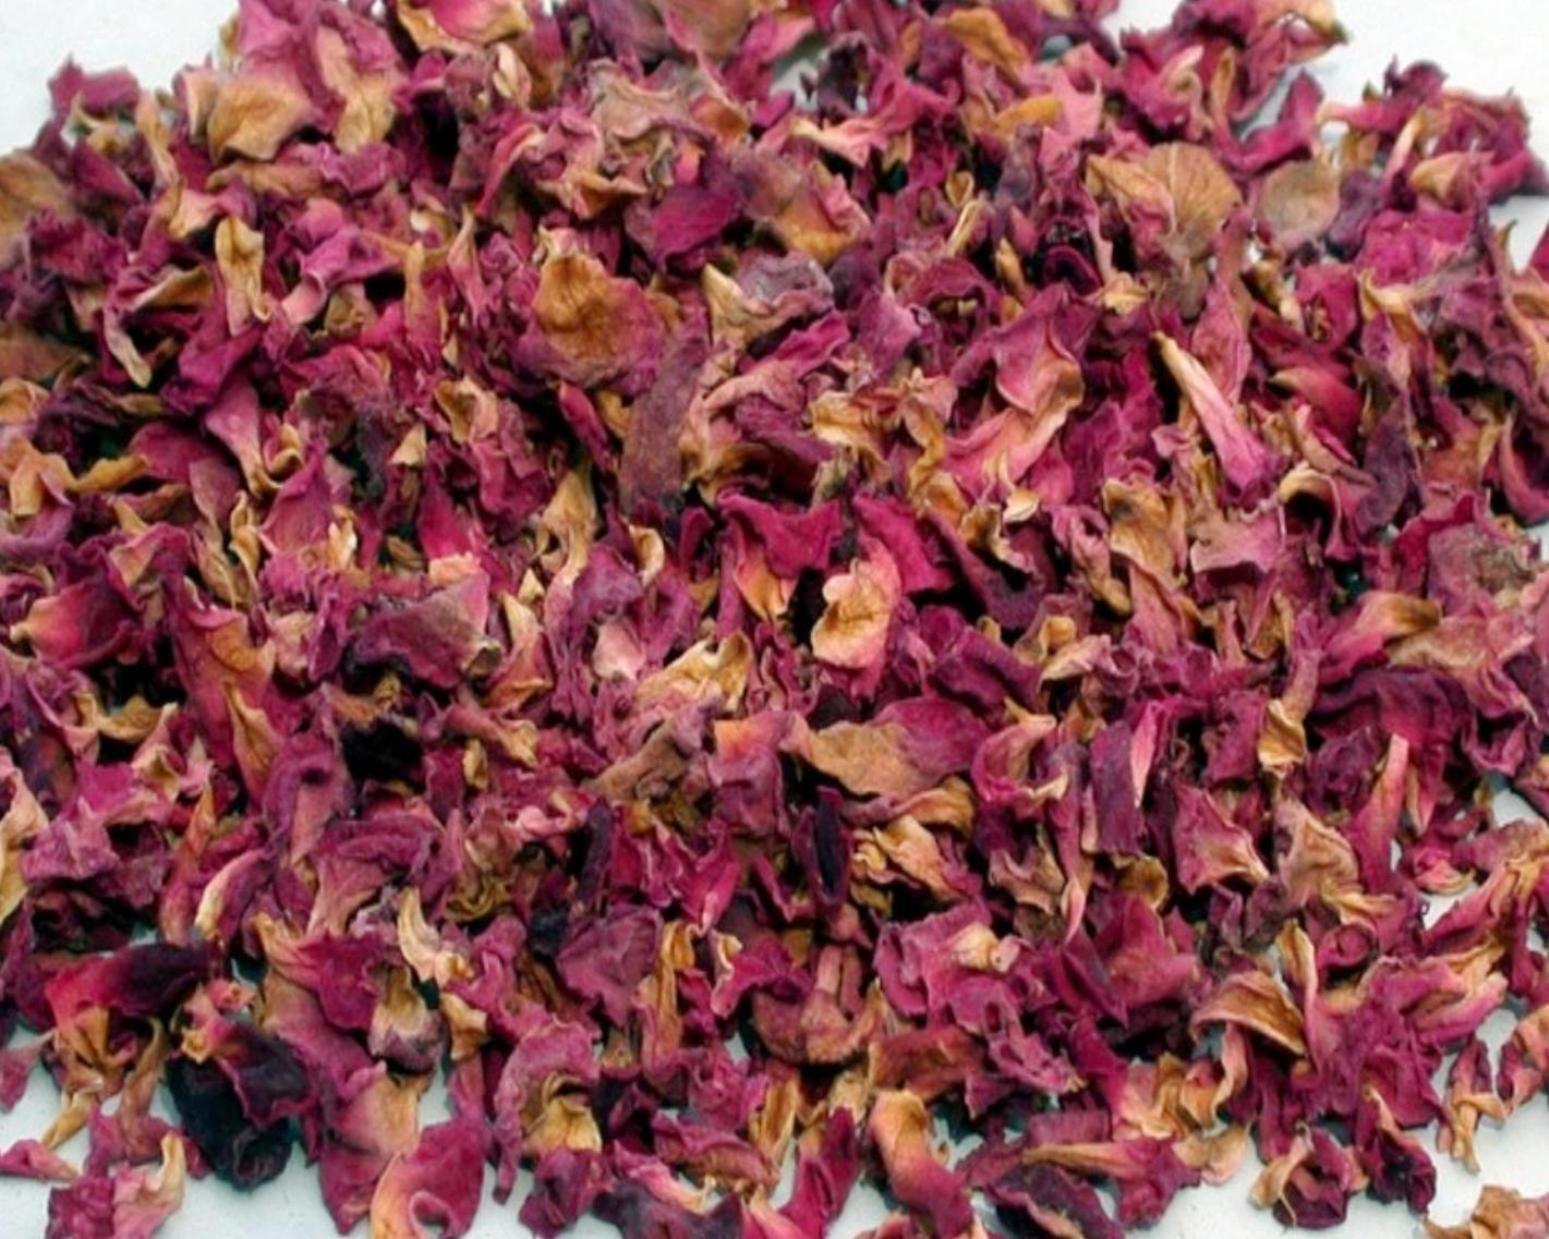 Rose flower petals g sun dried edible natural gulab phool soap